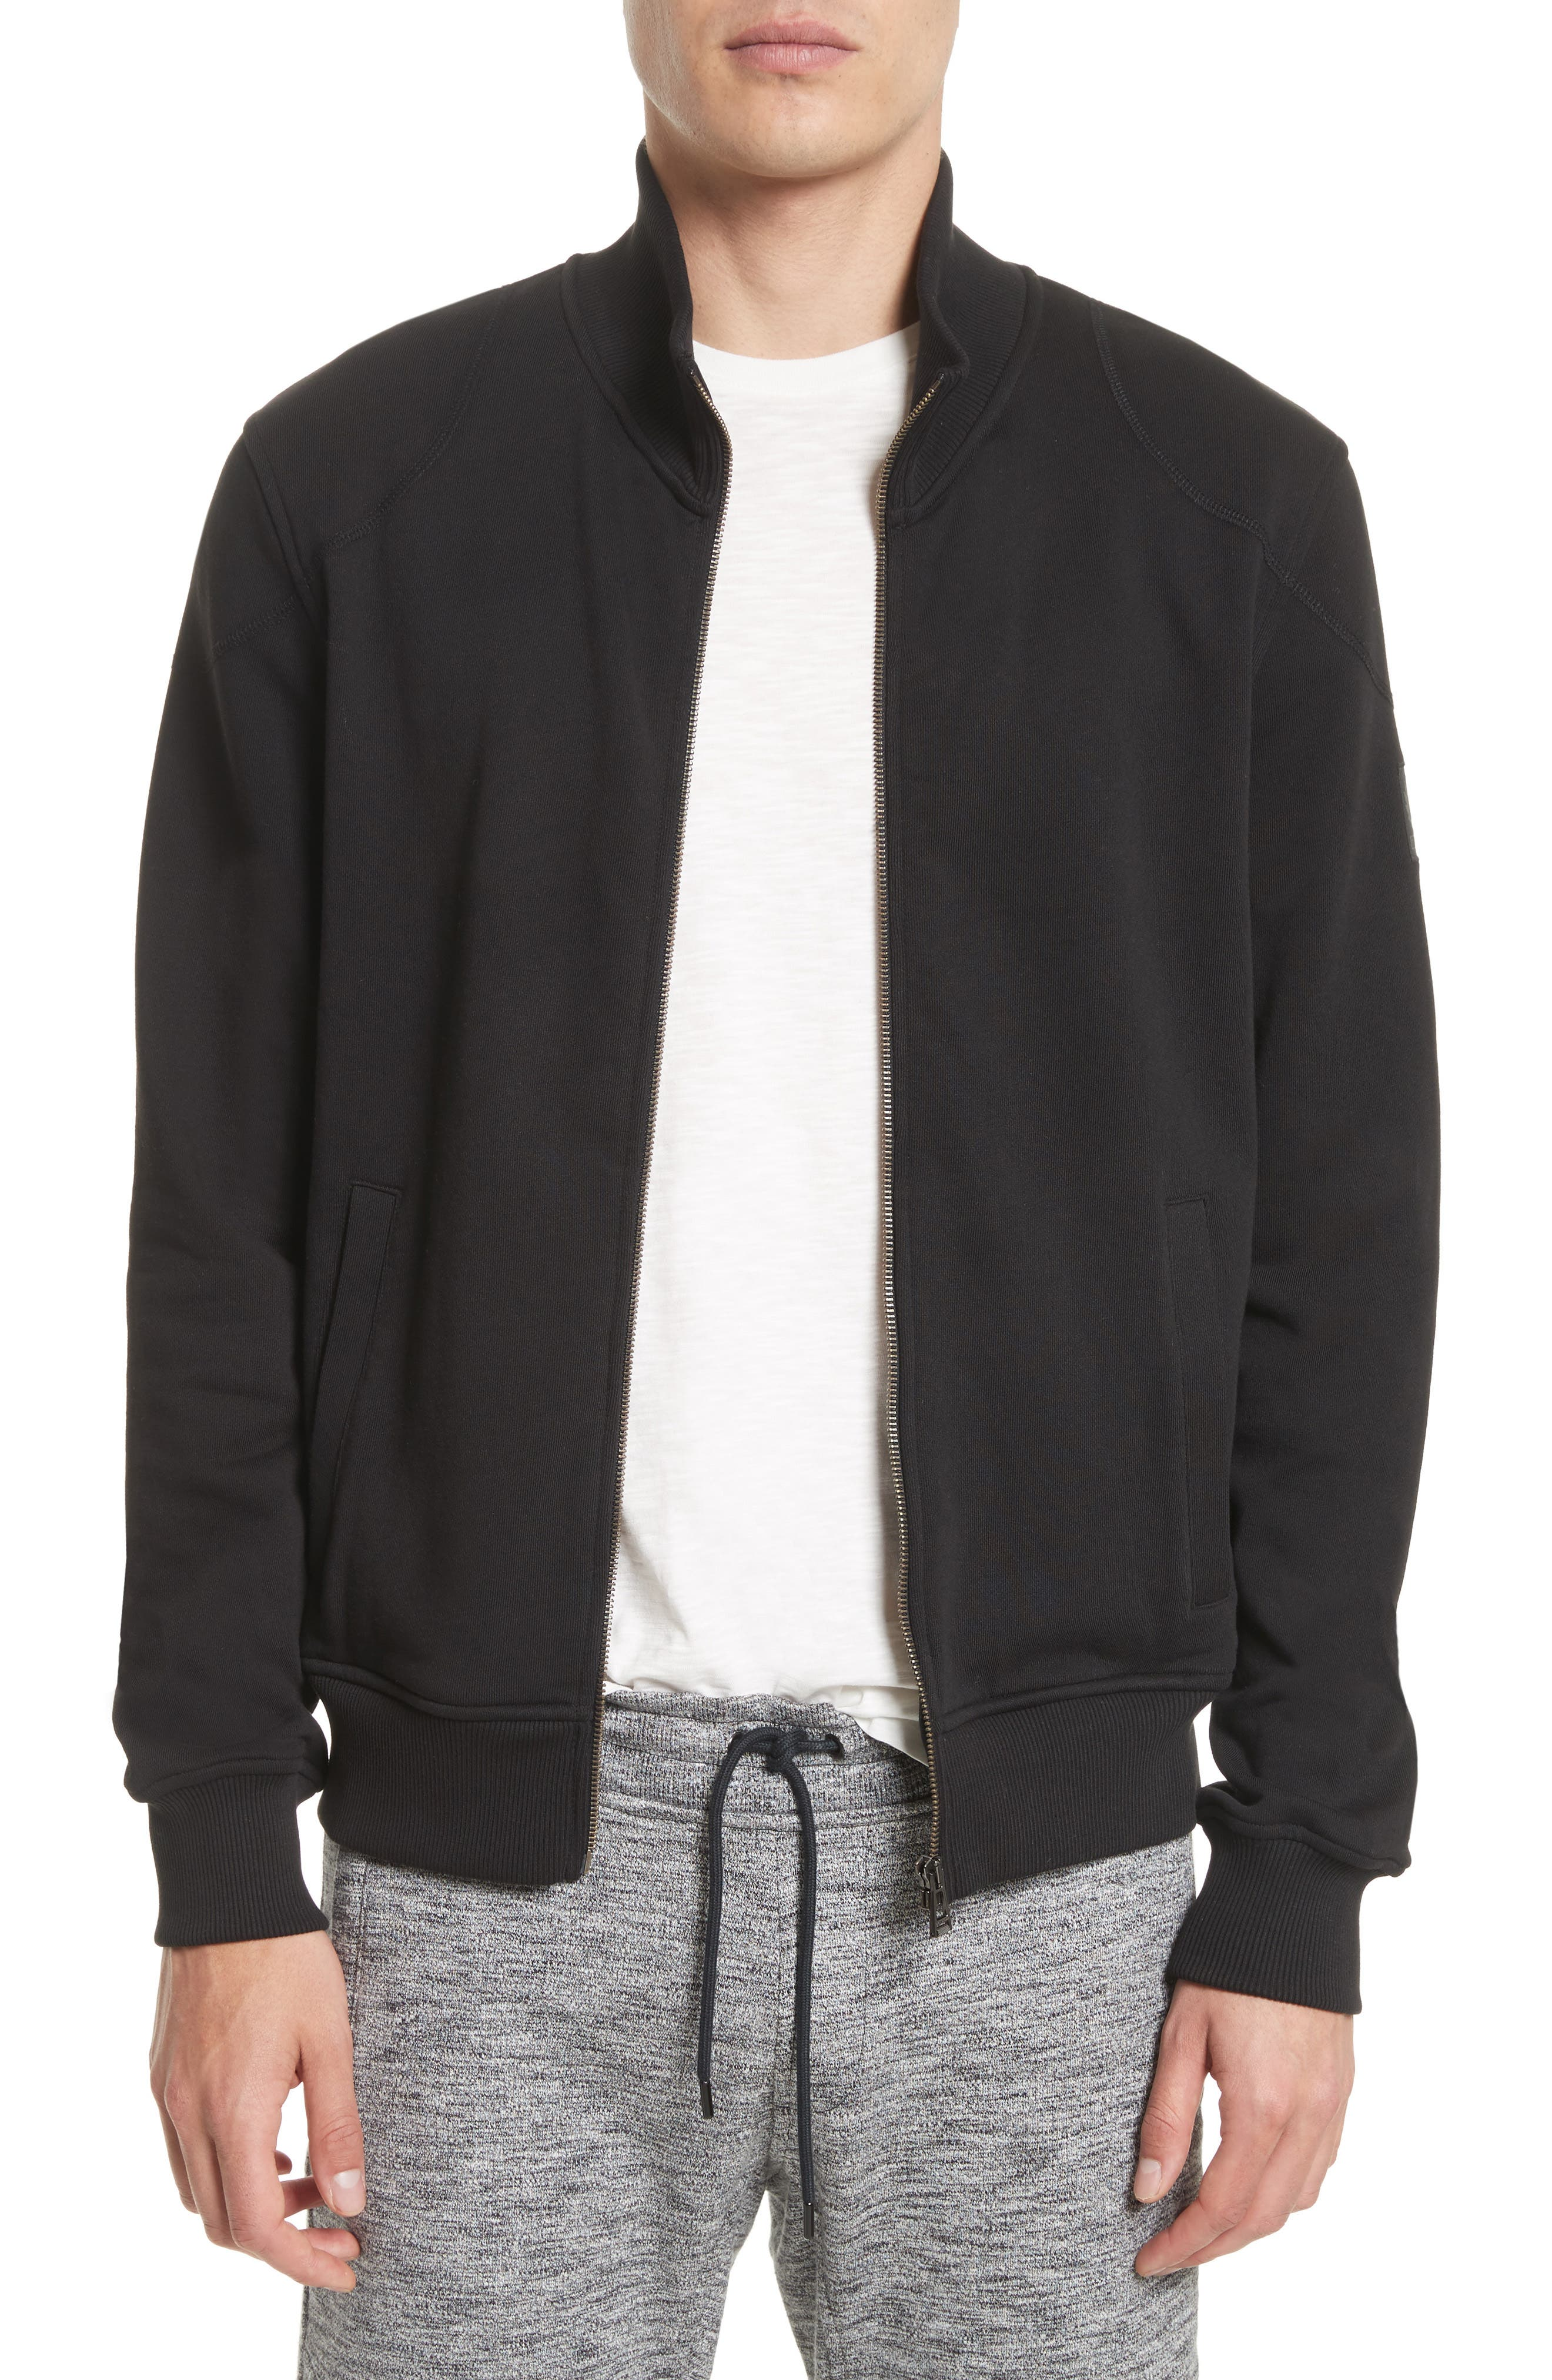 Alternate Image 1 Selected - Belstaff Staplefield Mock Neck Full Zip Sweater